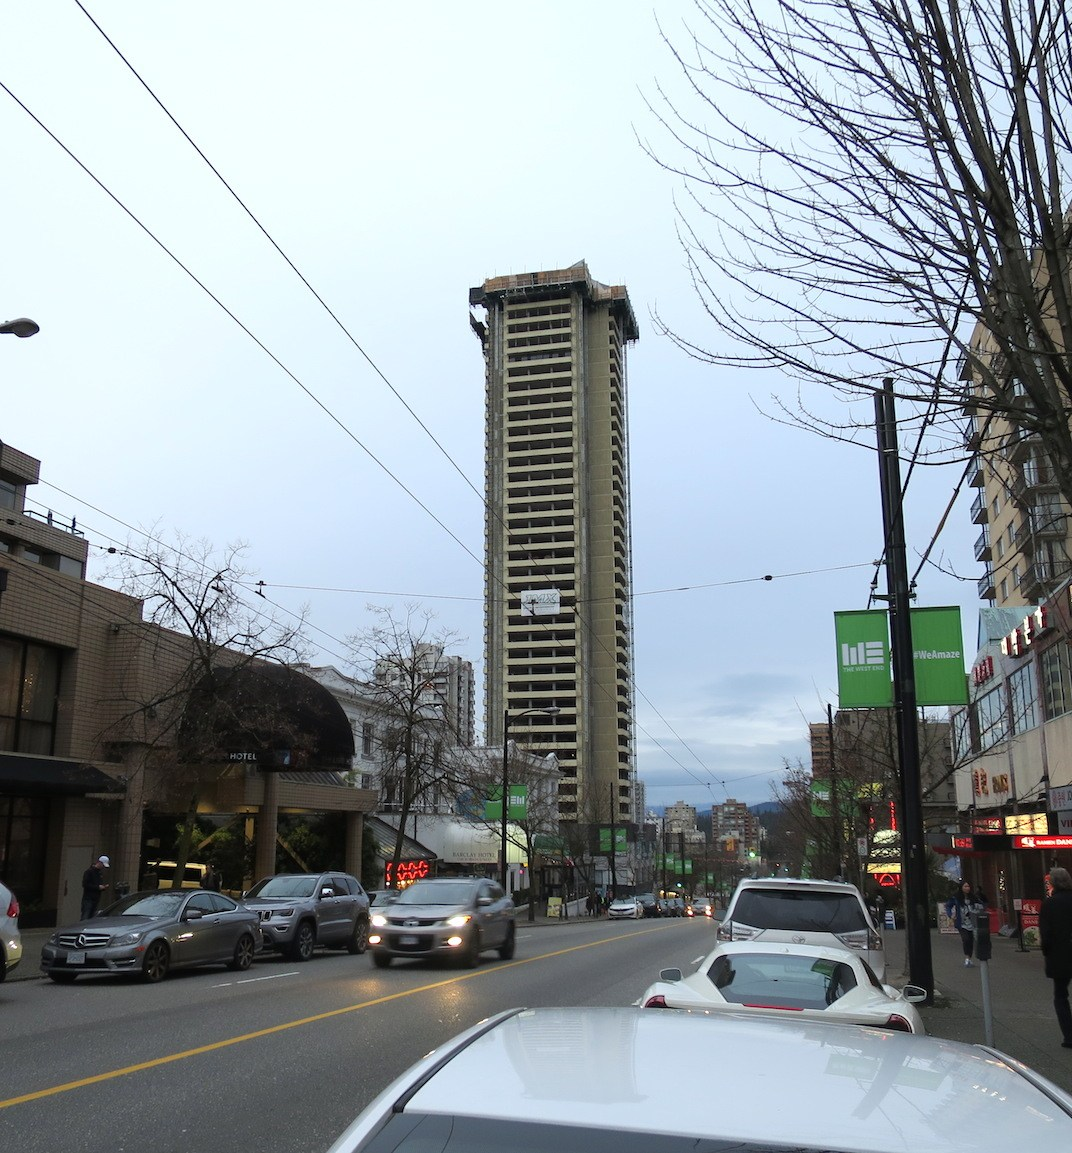 Empire Landmark Hotel Vancouver